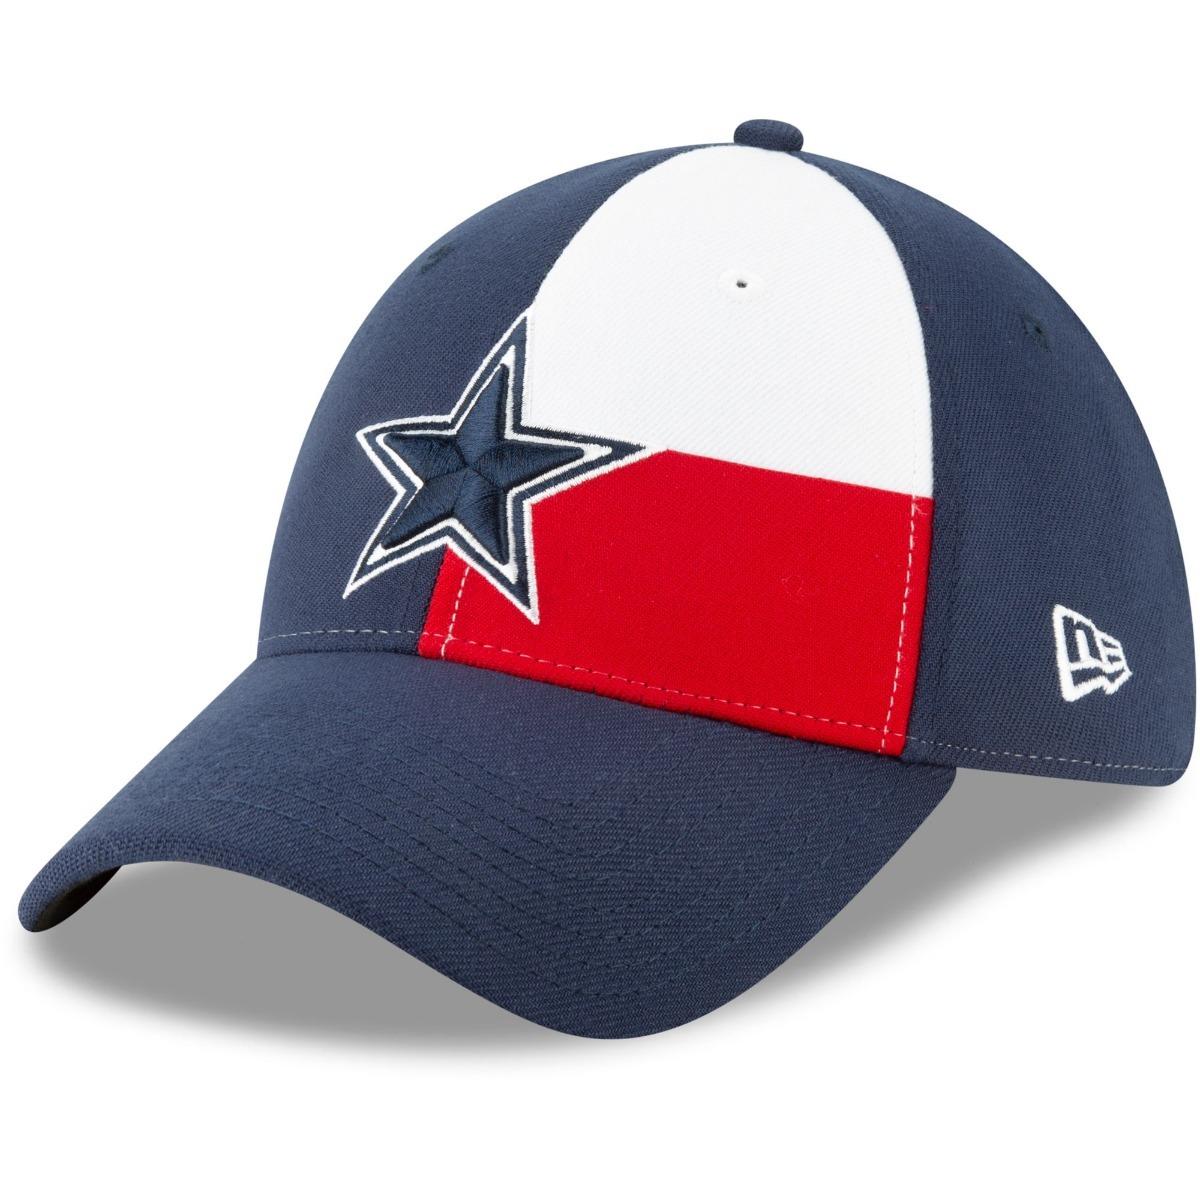 eb974085fc58 Gorra Dallas Cowboys New Era 2019 Nfl Draft Spotlight 39thir